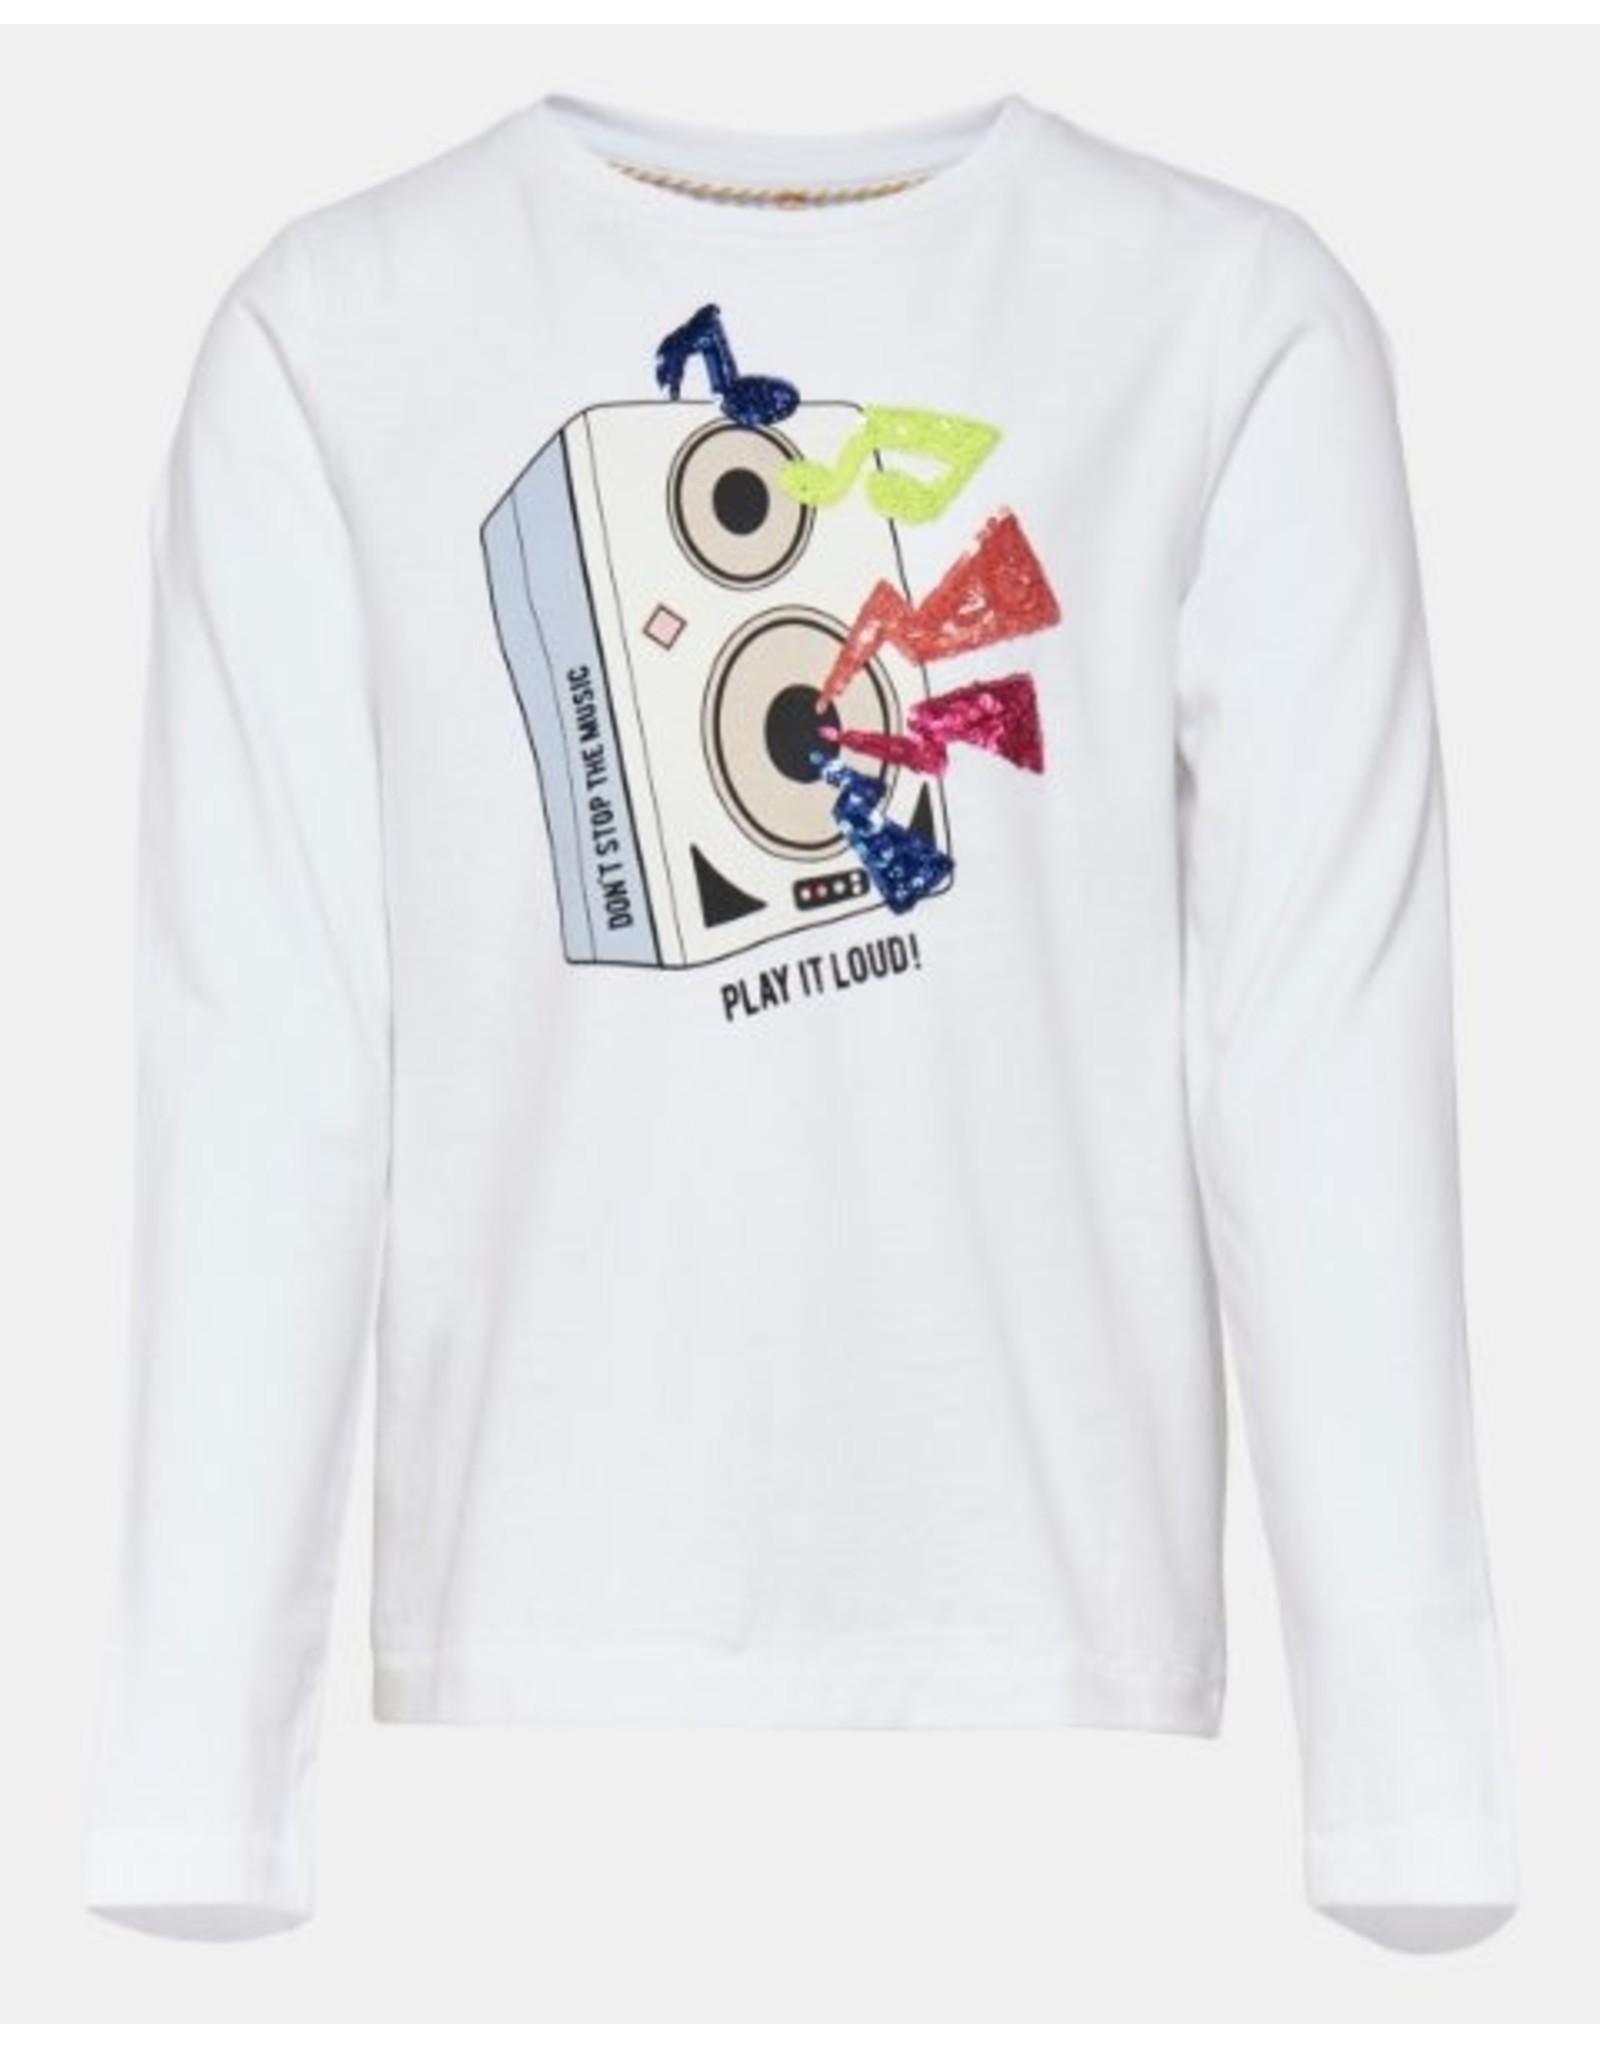 KIDS ONLY Witte t-shirt met speaker box print